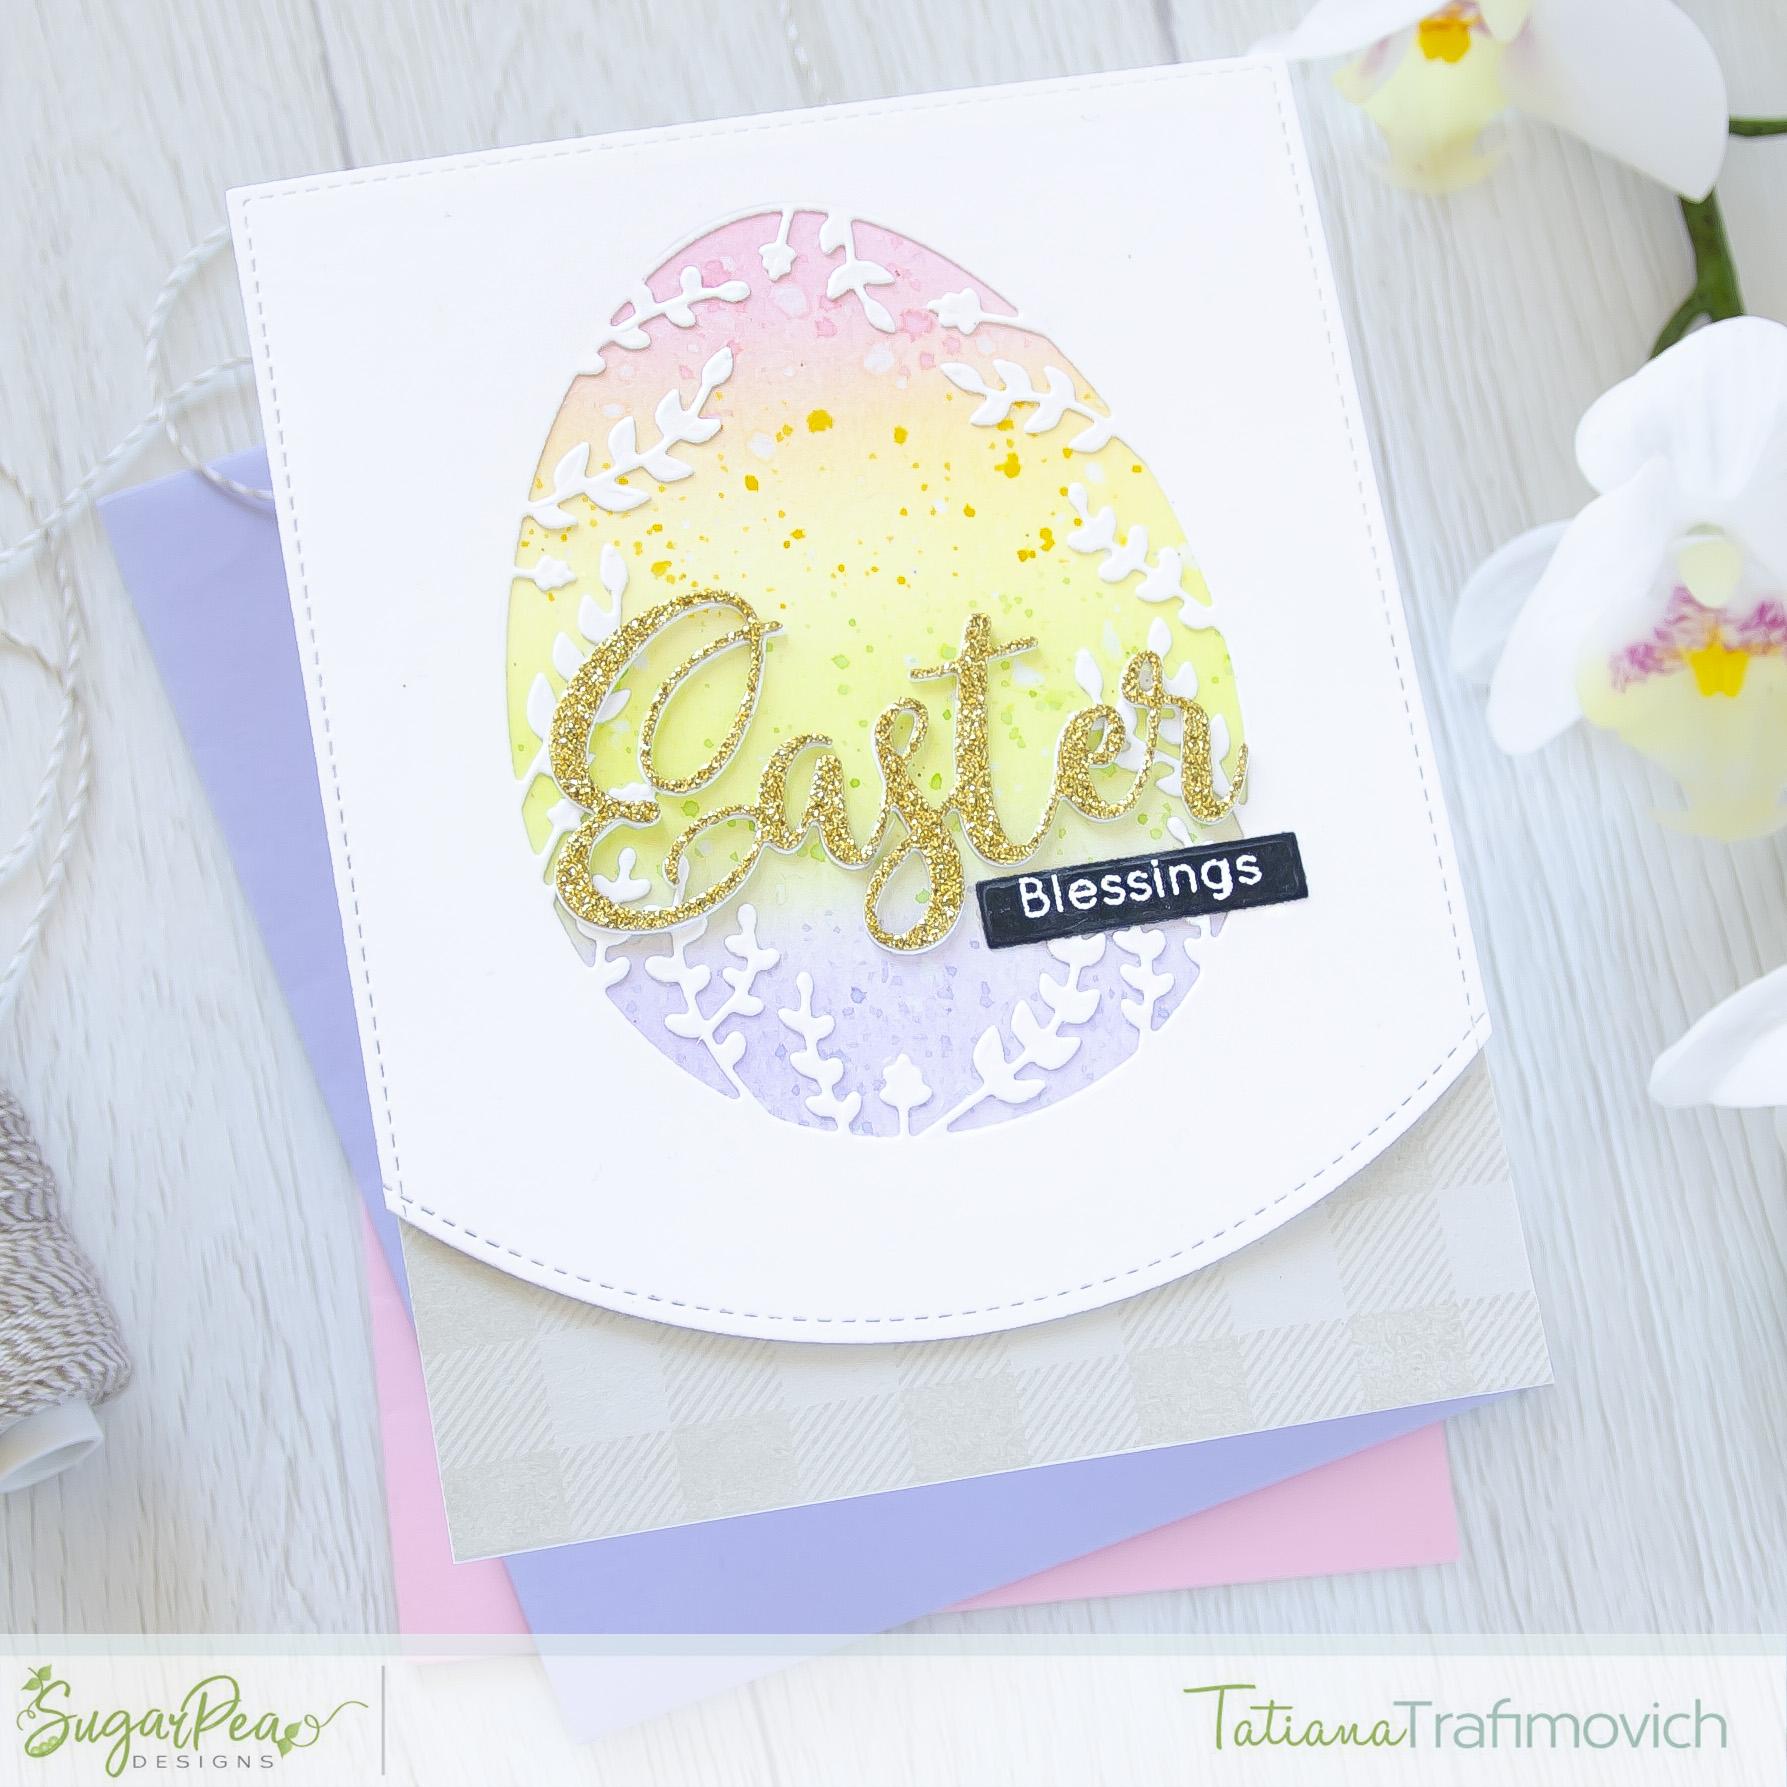 Easter Blessings #handmade card by Tatiana Trafimovich #tatianacraftandart - Egg Cut-Away Die by SugarPea Designs #sugarpeadesigns